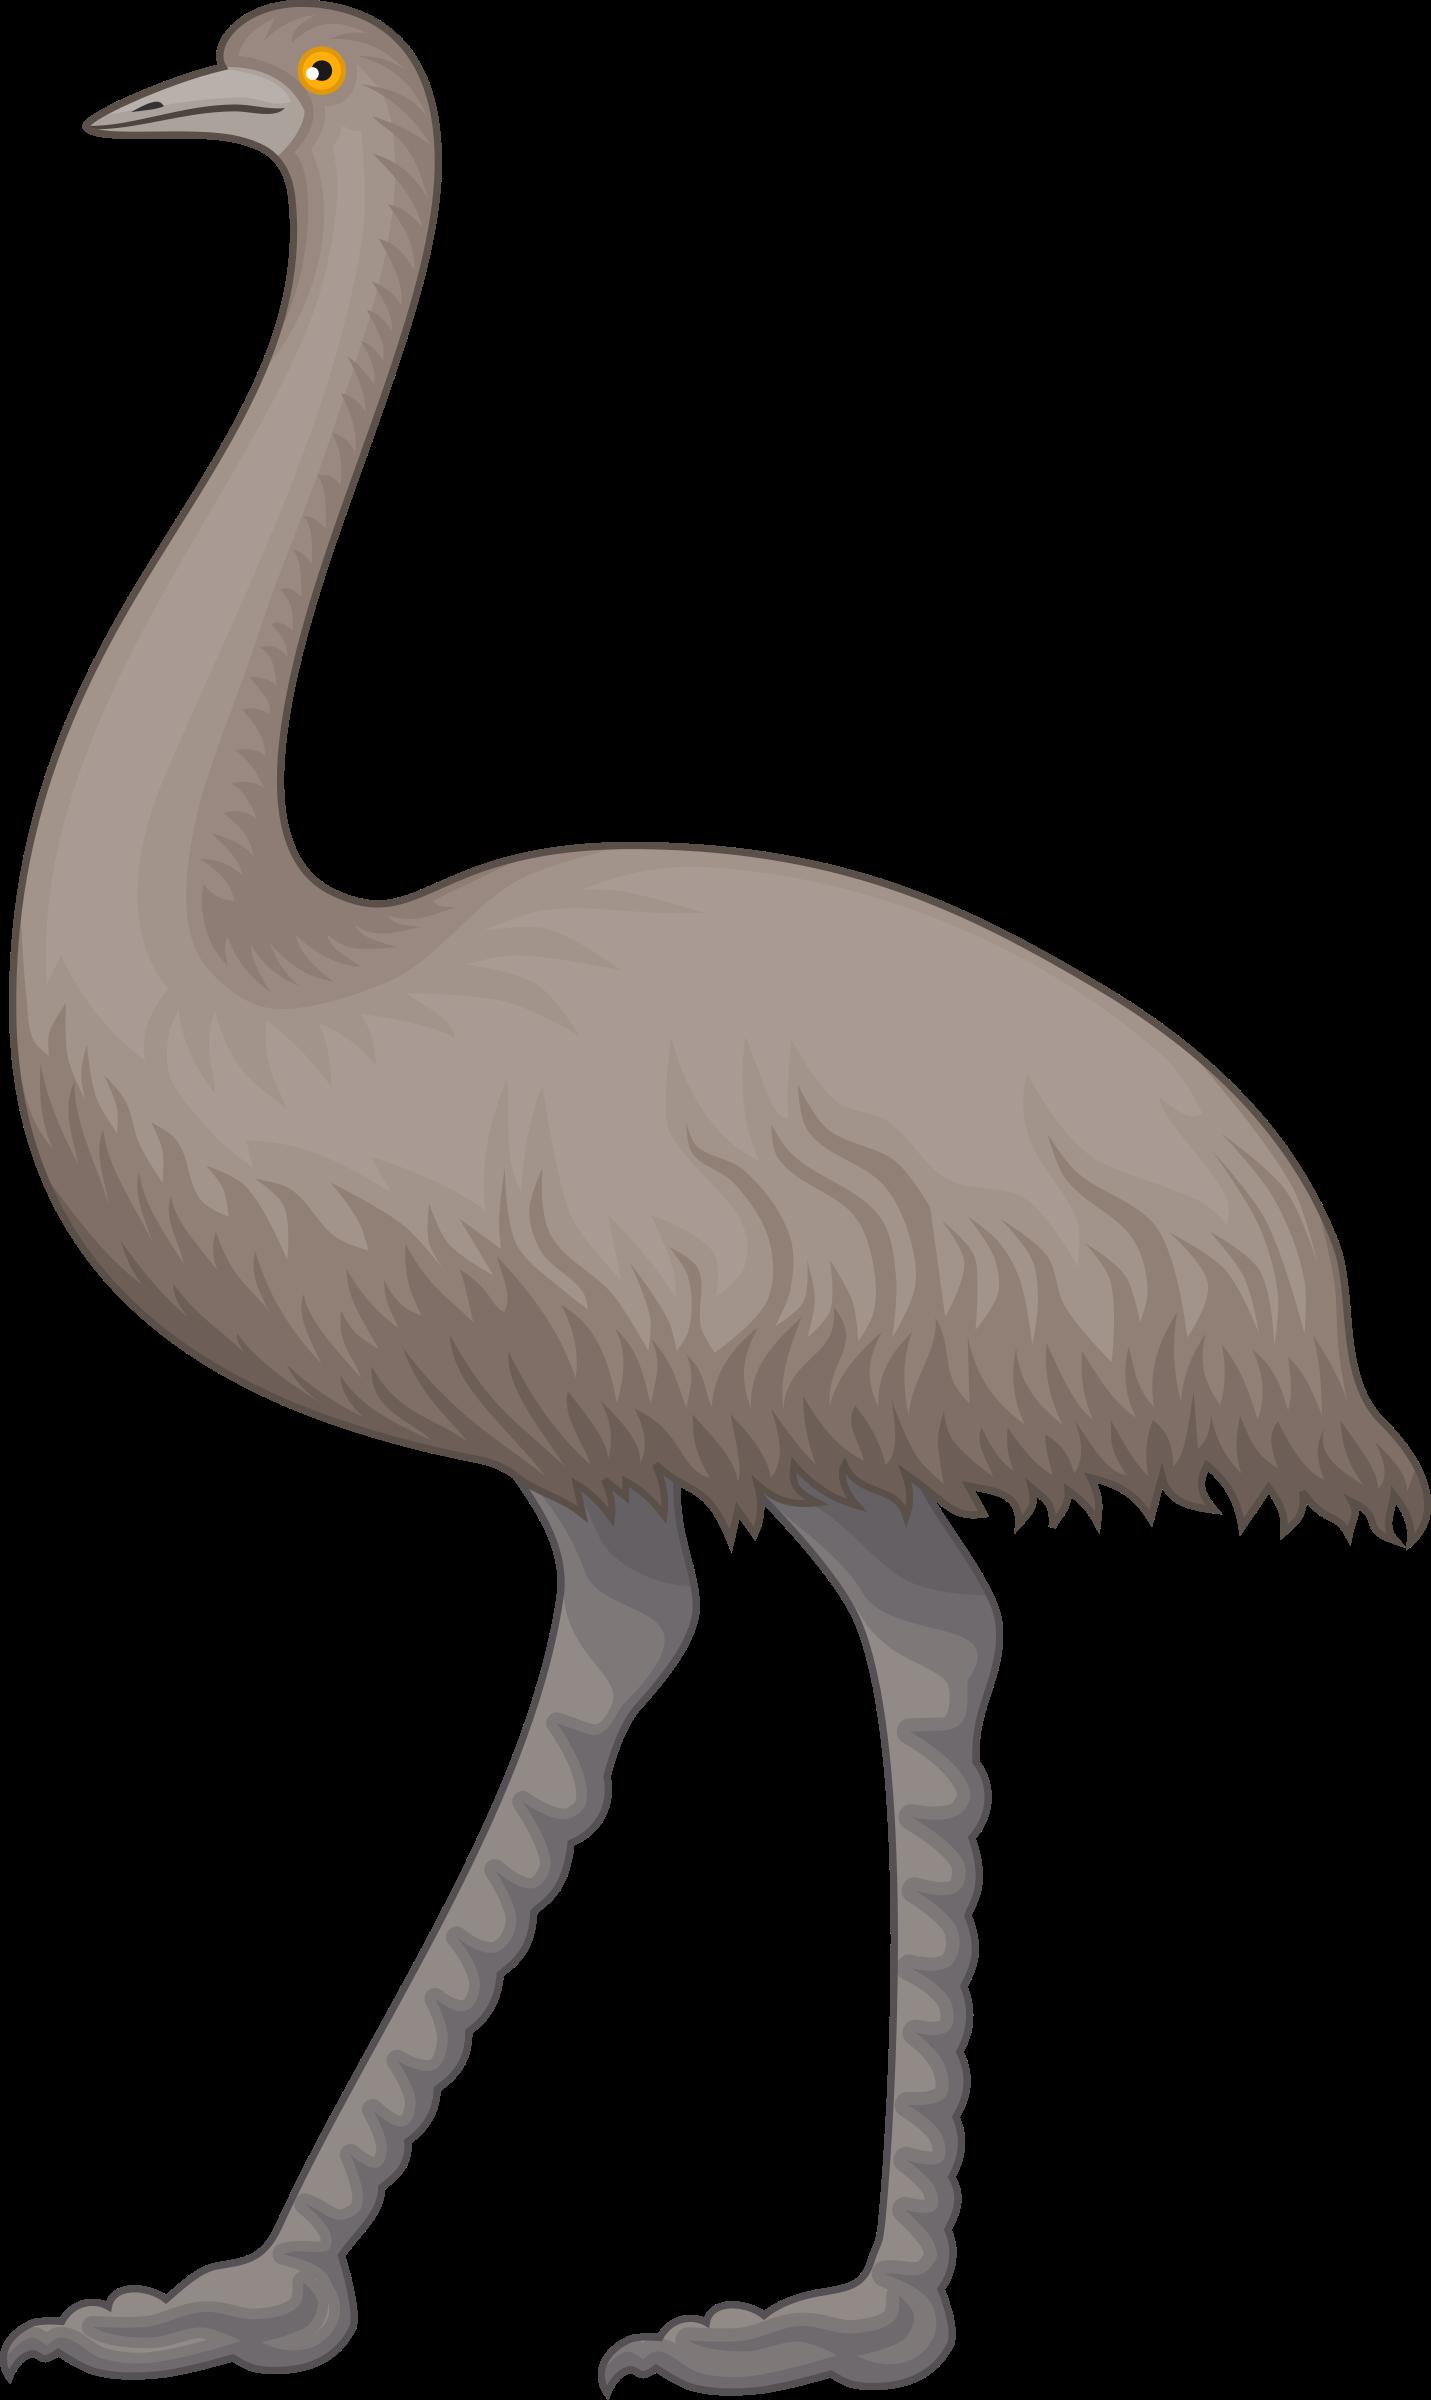 Line Art Emui : Cartoon emu png transparent images pluspng